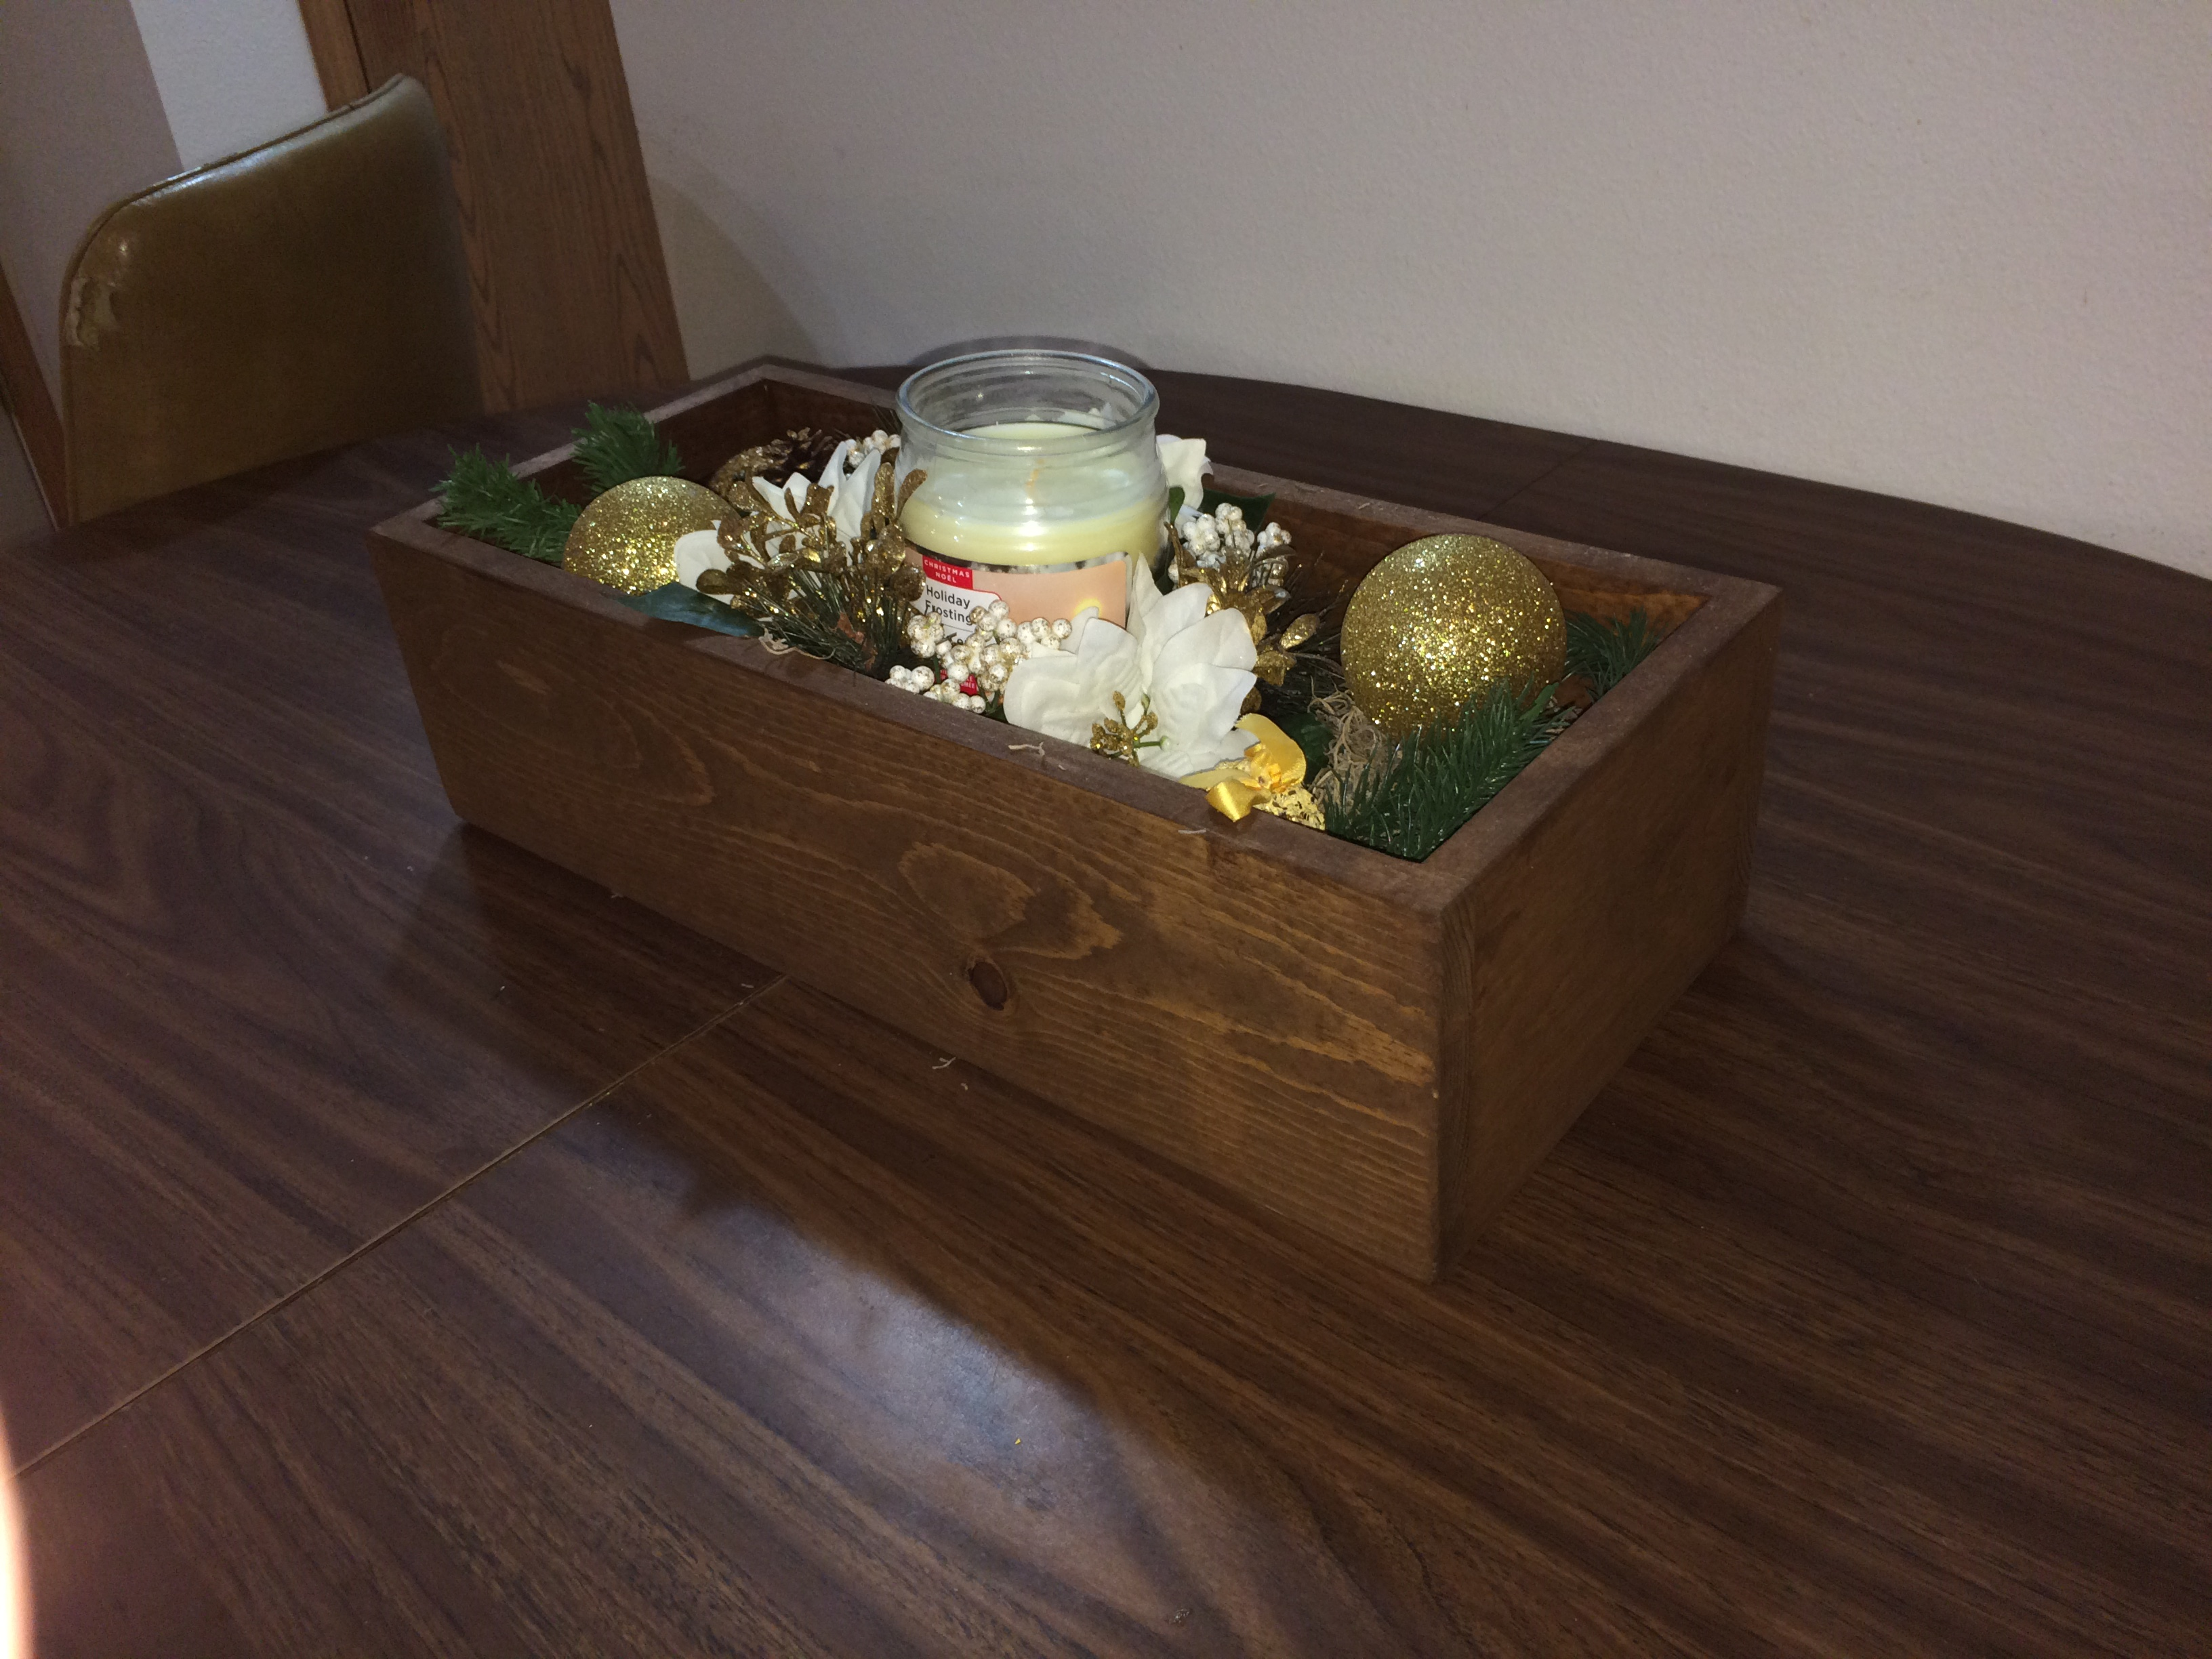 Picture of DIY Decorative Wooden Box Centerpiece